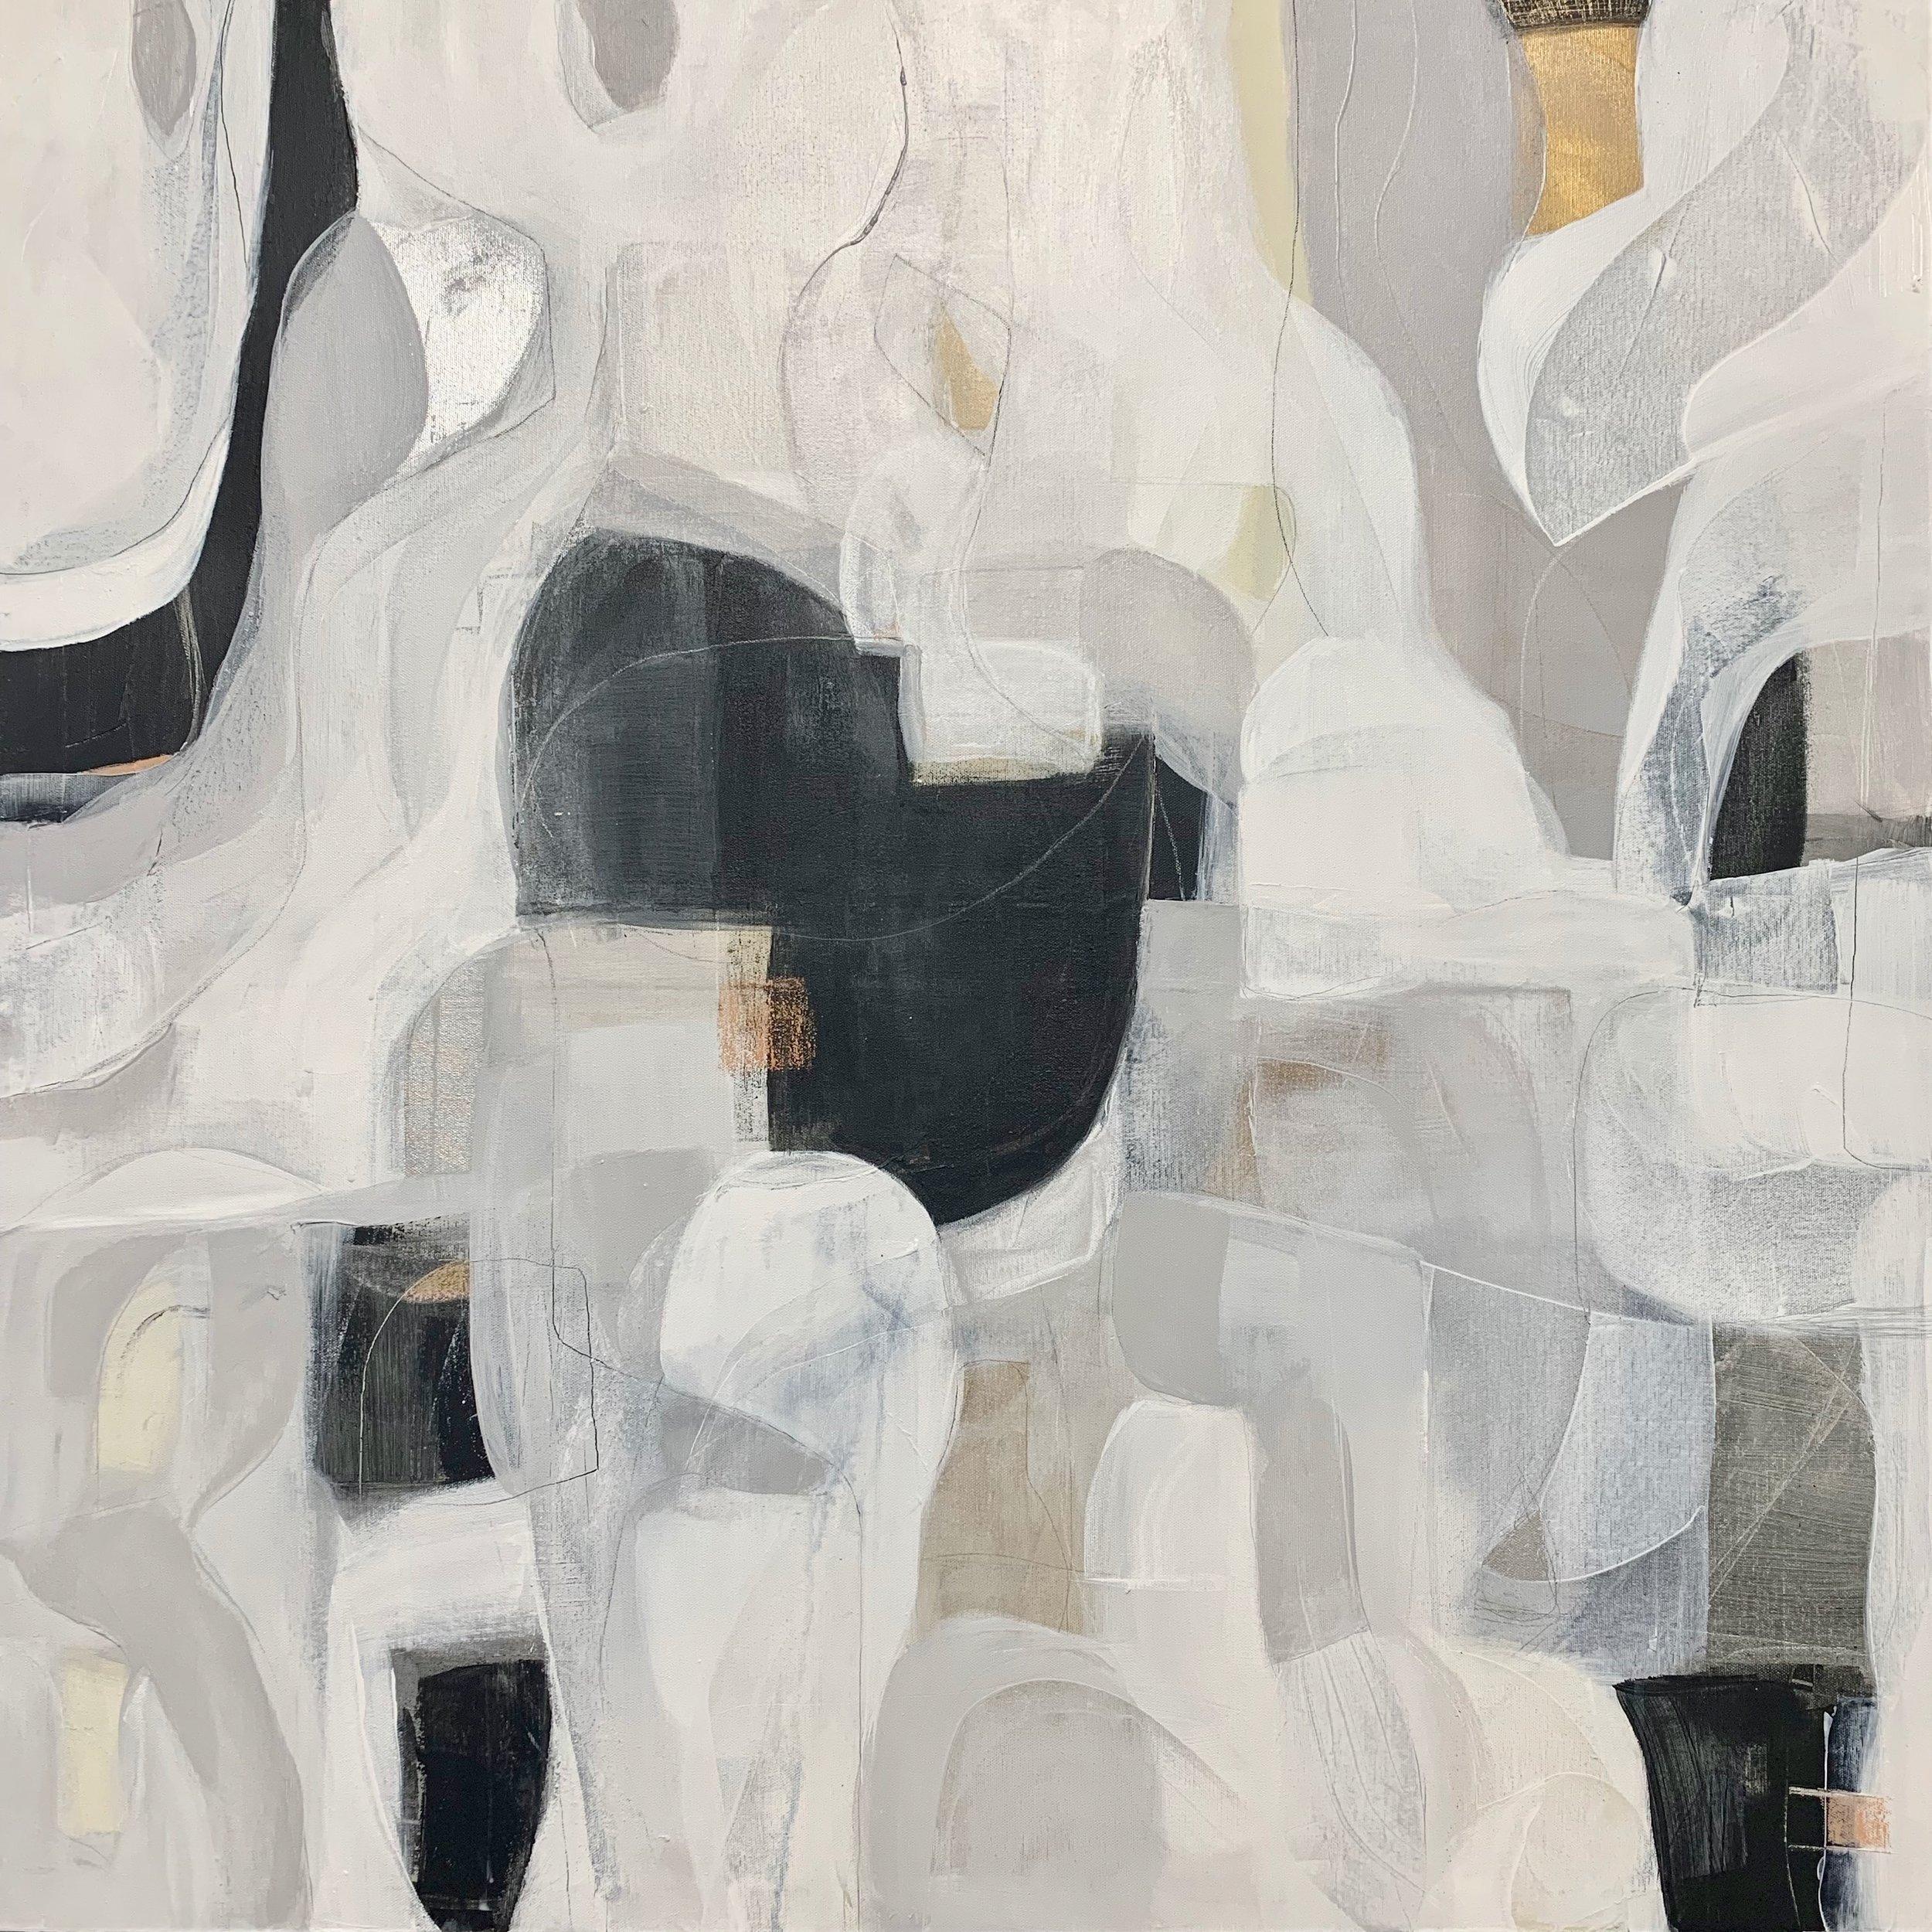 Avalon Estrella Late Night Jazz Series#Mixed Media on Canvas#36 x 36 inches#$2,150